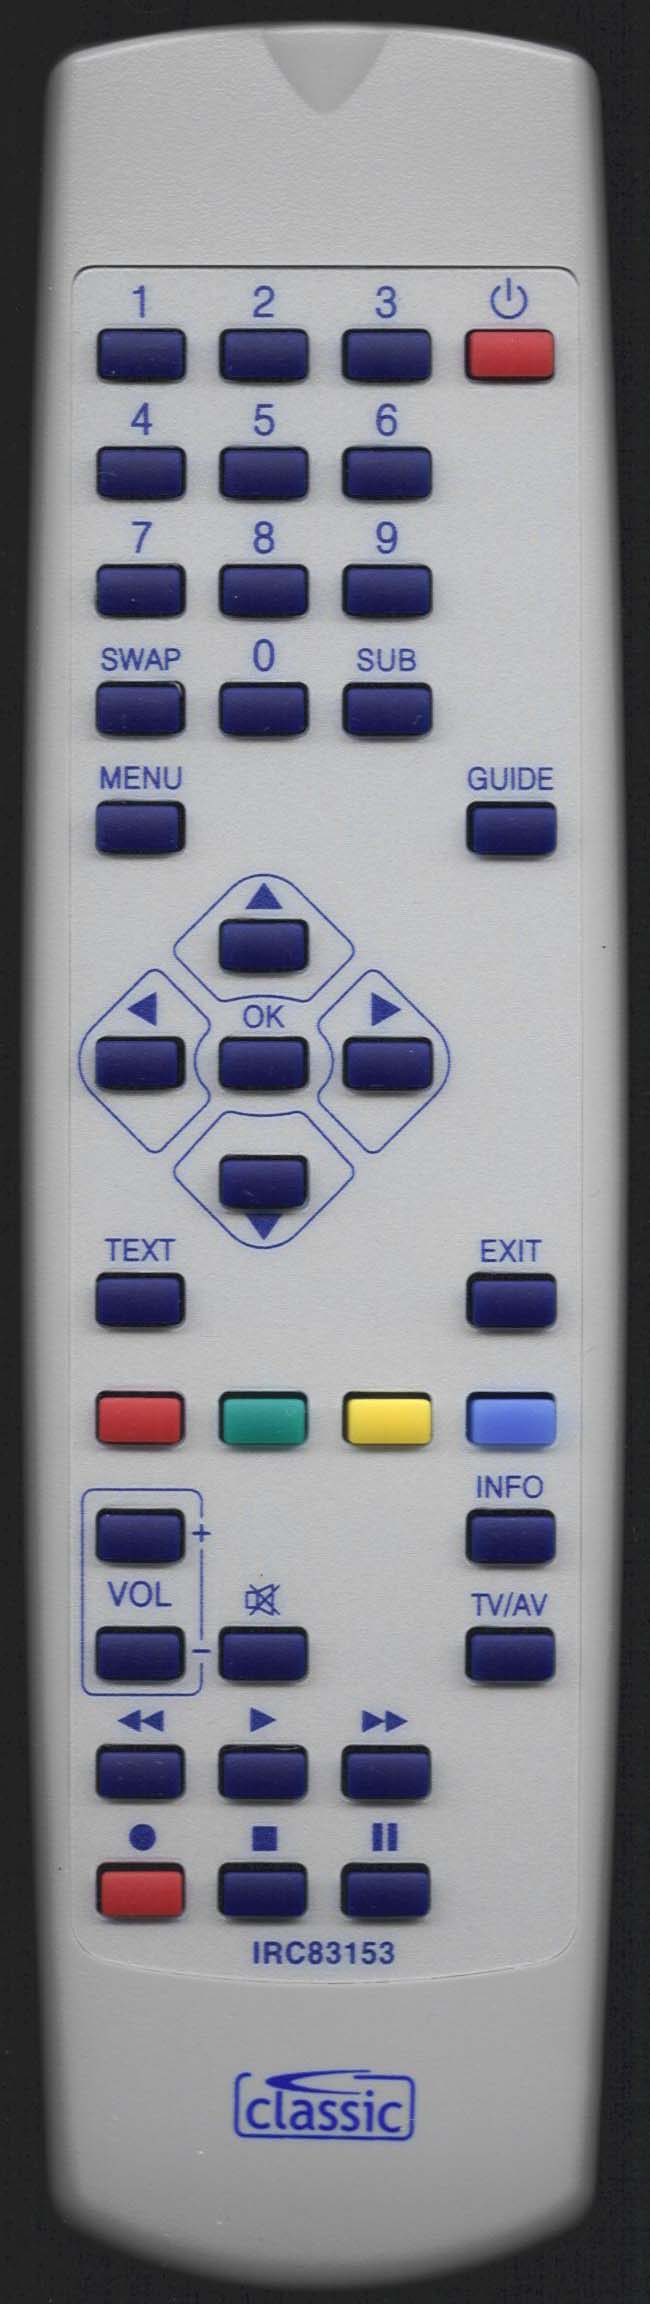 MATSUI M 1602PVR Replacement Remote Control